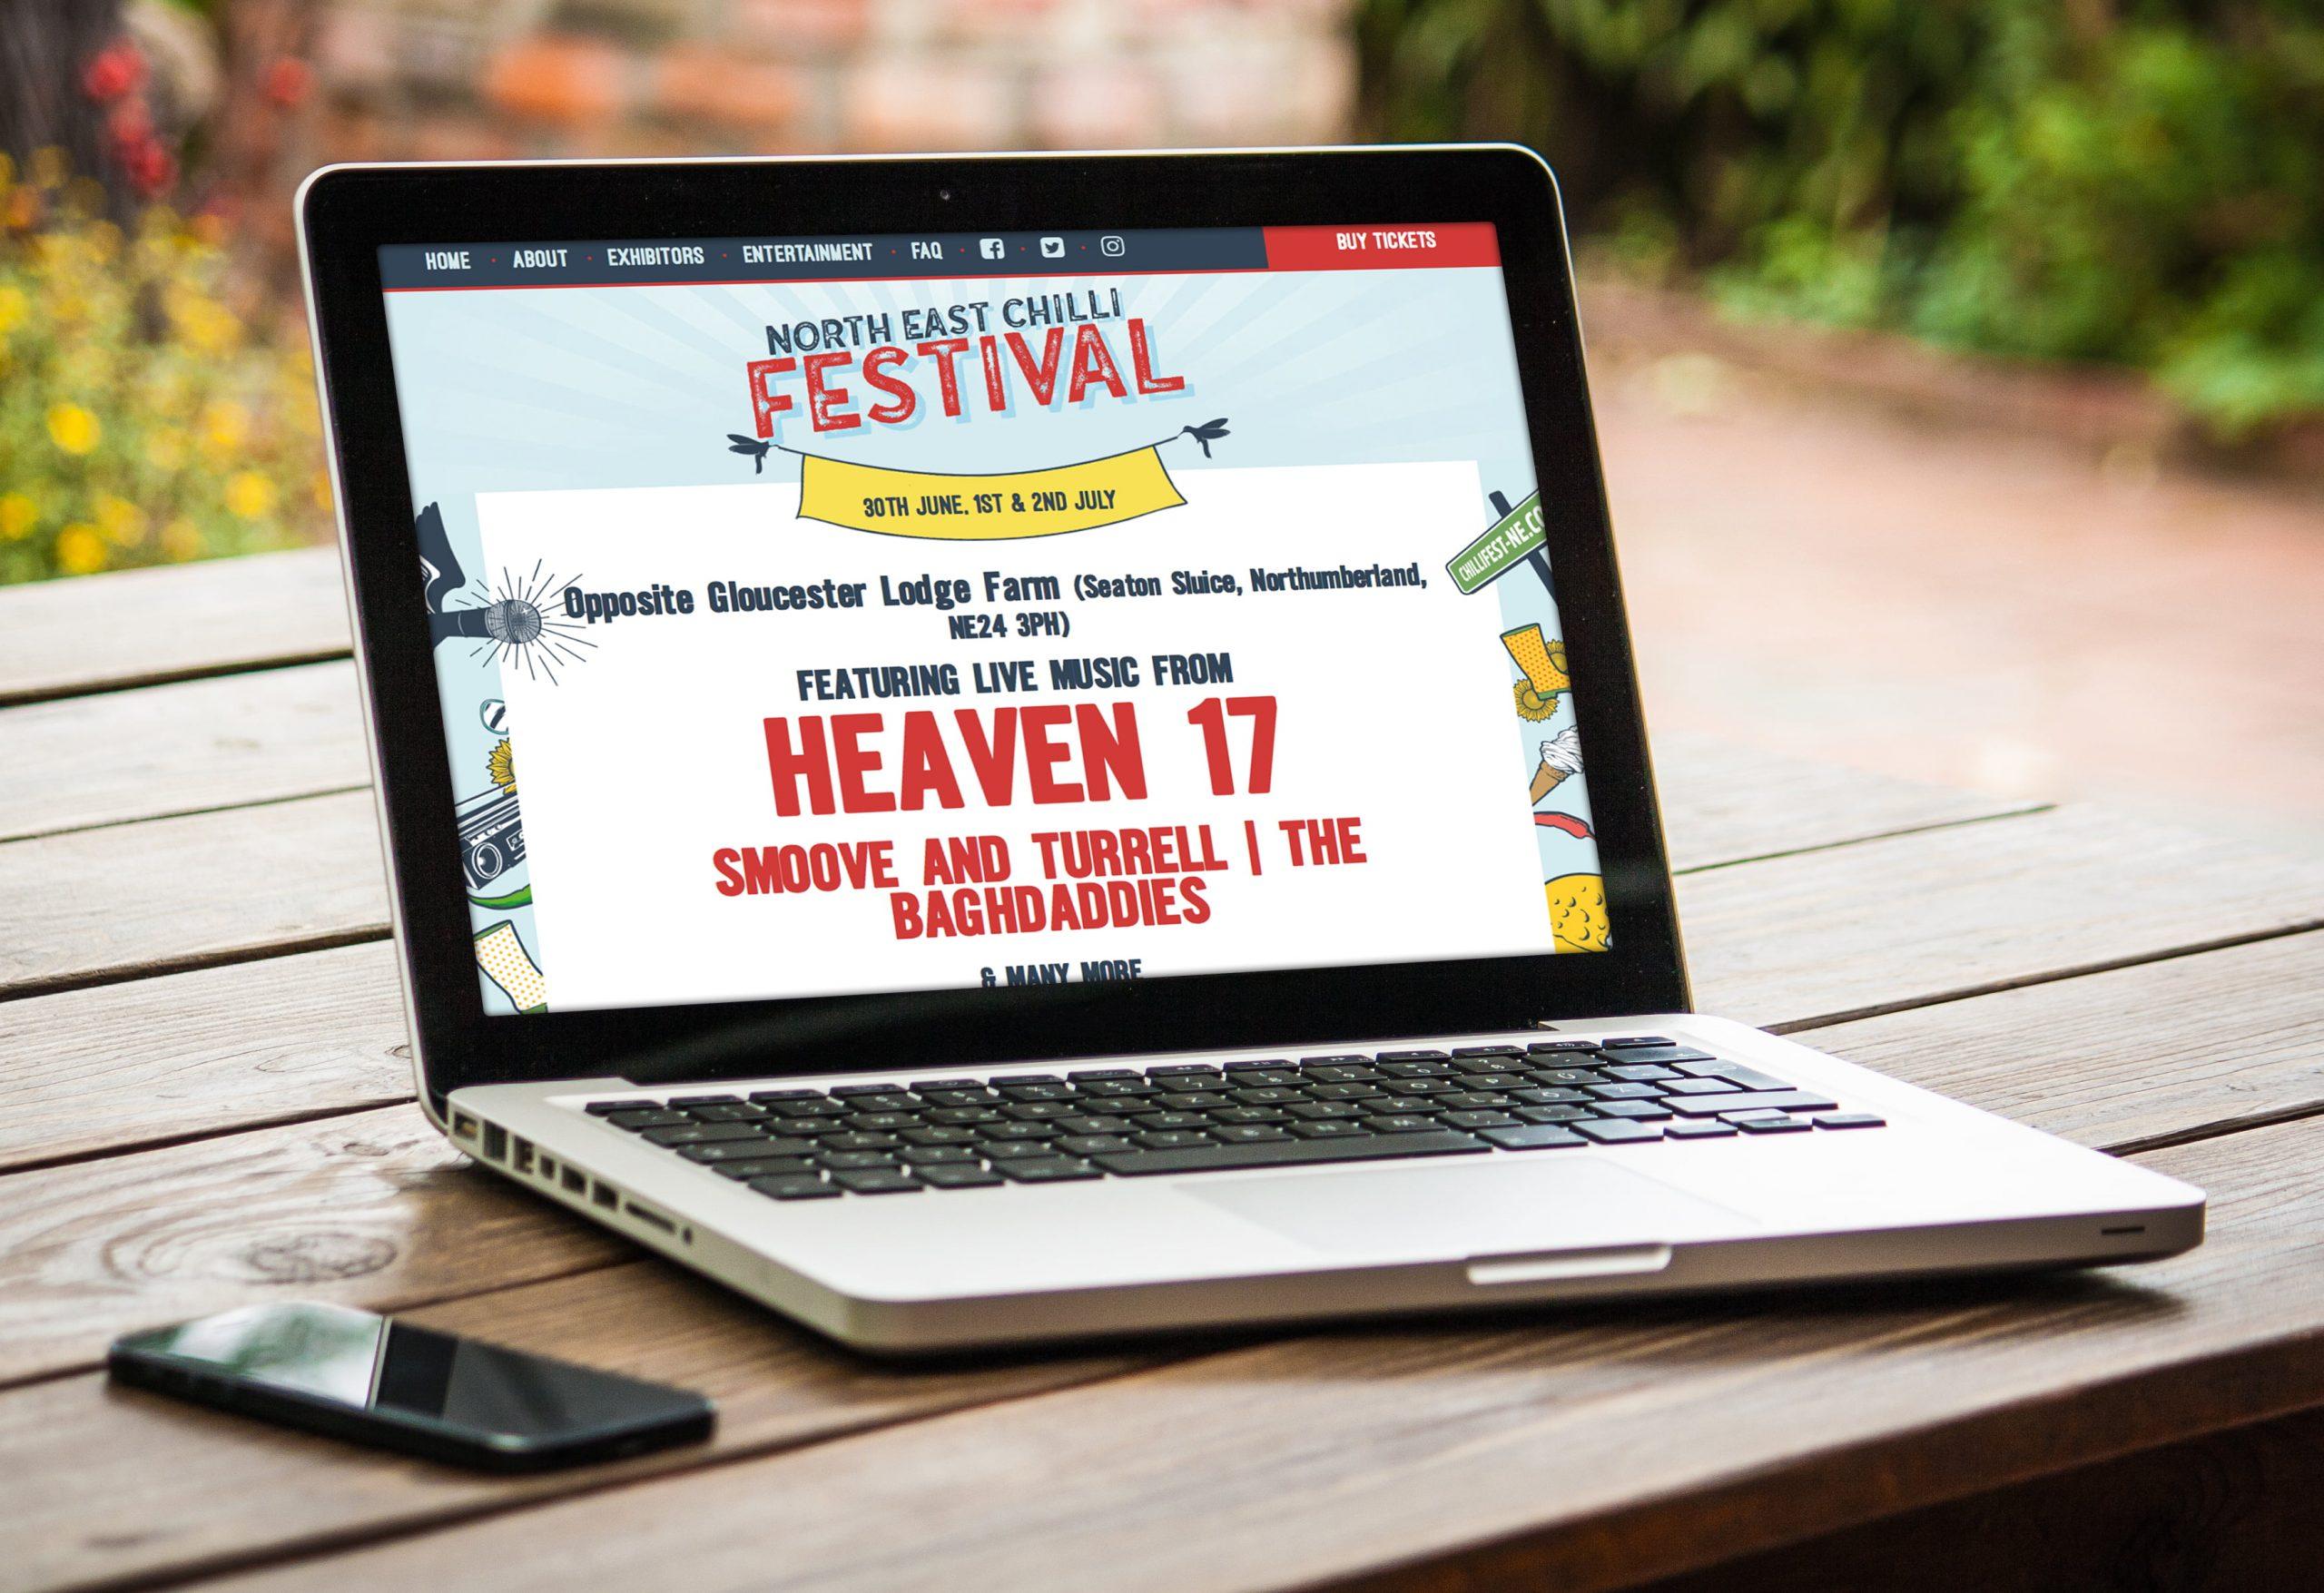 North East Chilli Festival website displayed on laptop